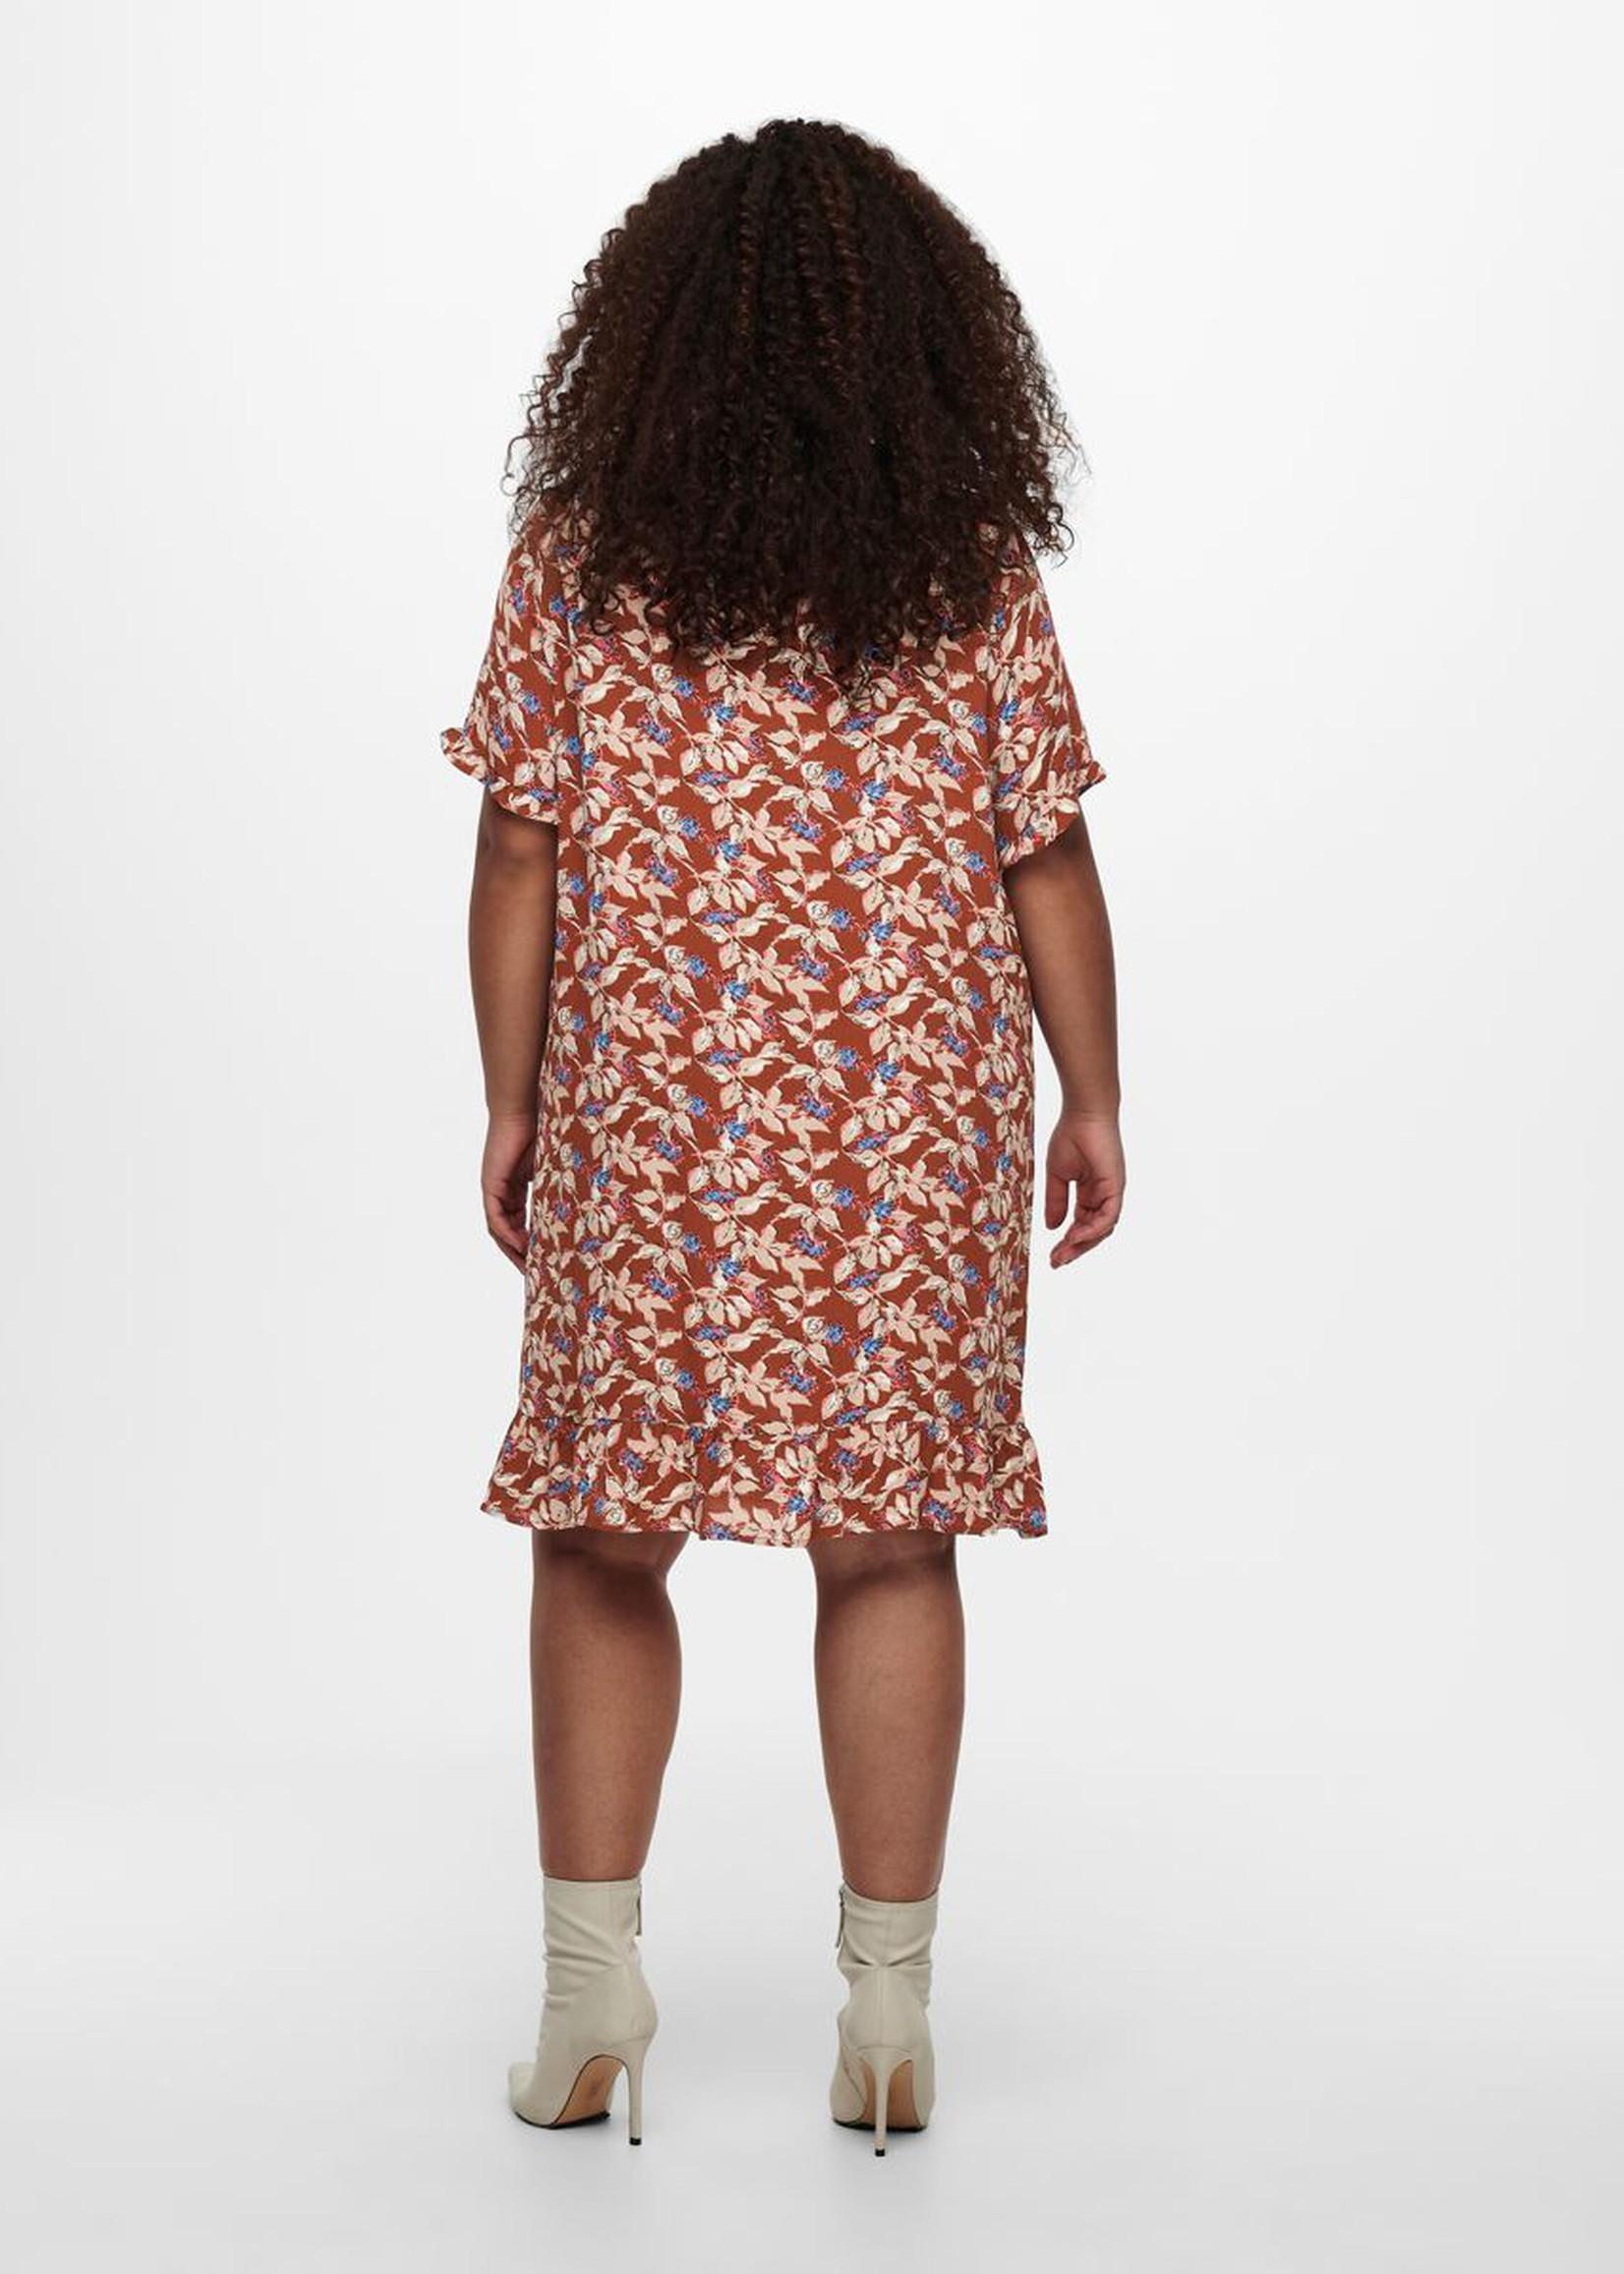 Only Carmakoma Only Carmakoma Lana Knee Dress